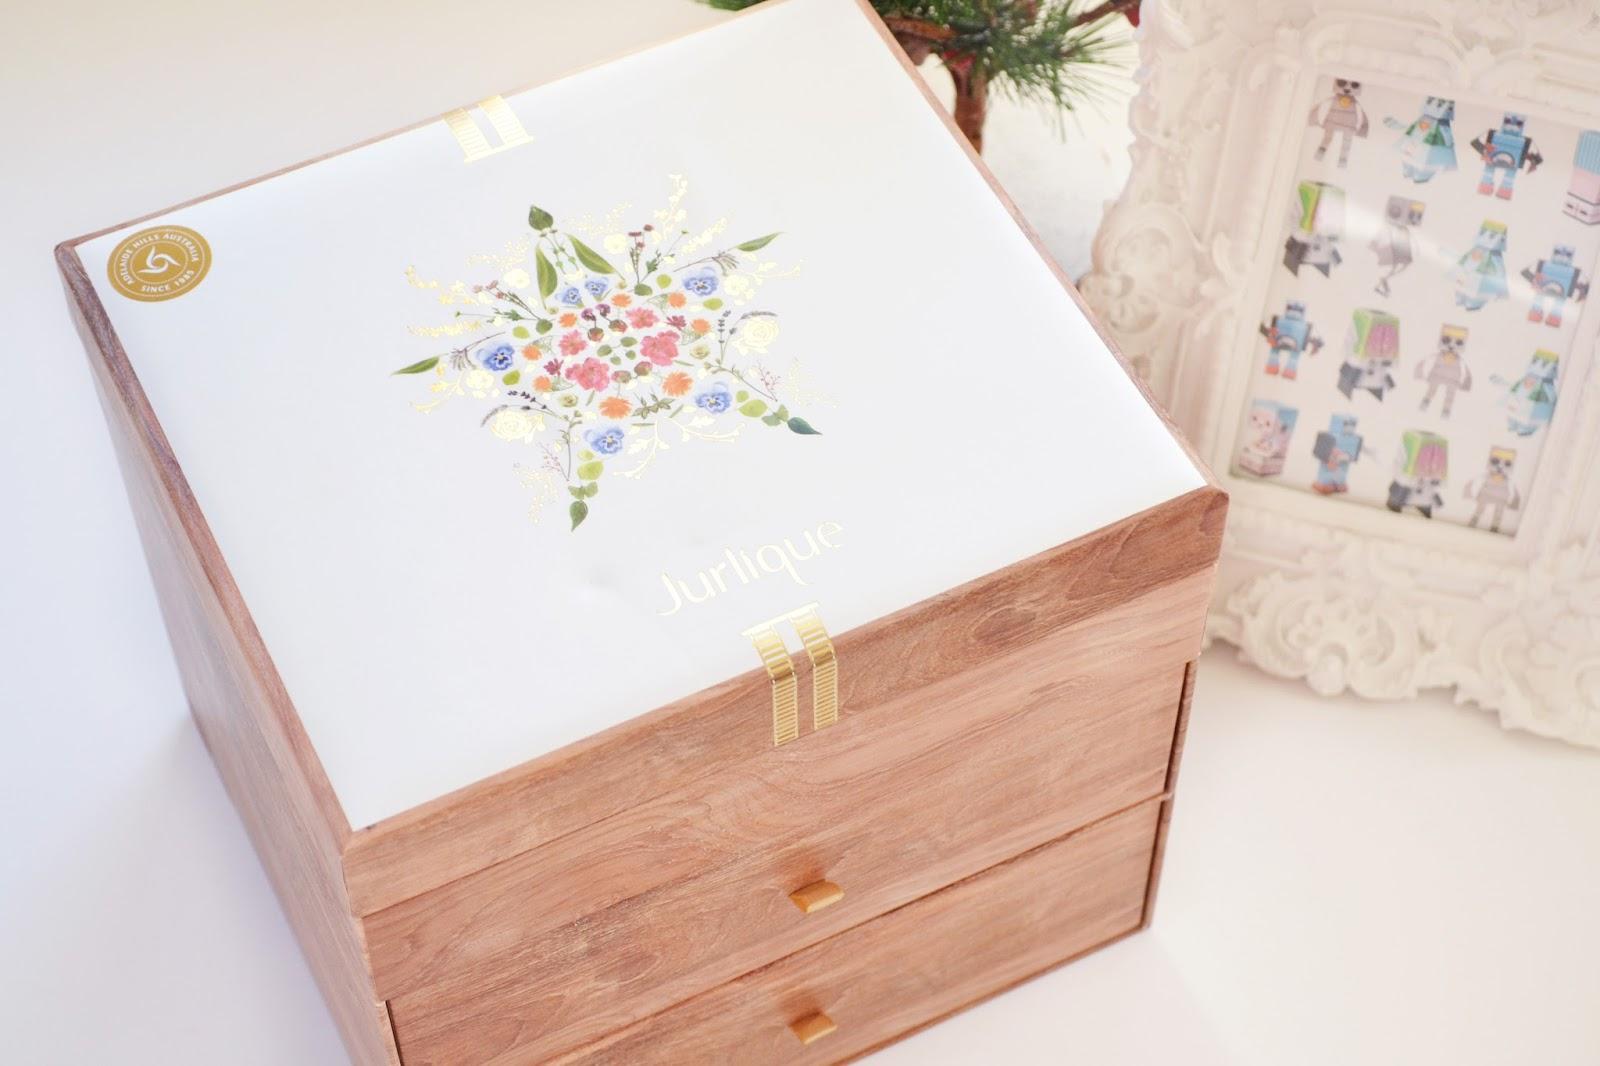 jurlique ultimate beauty gift set